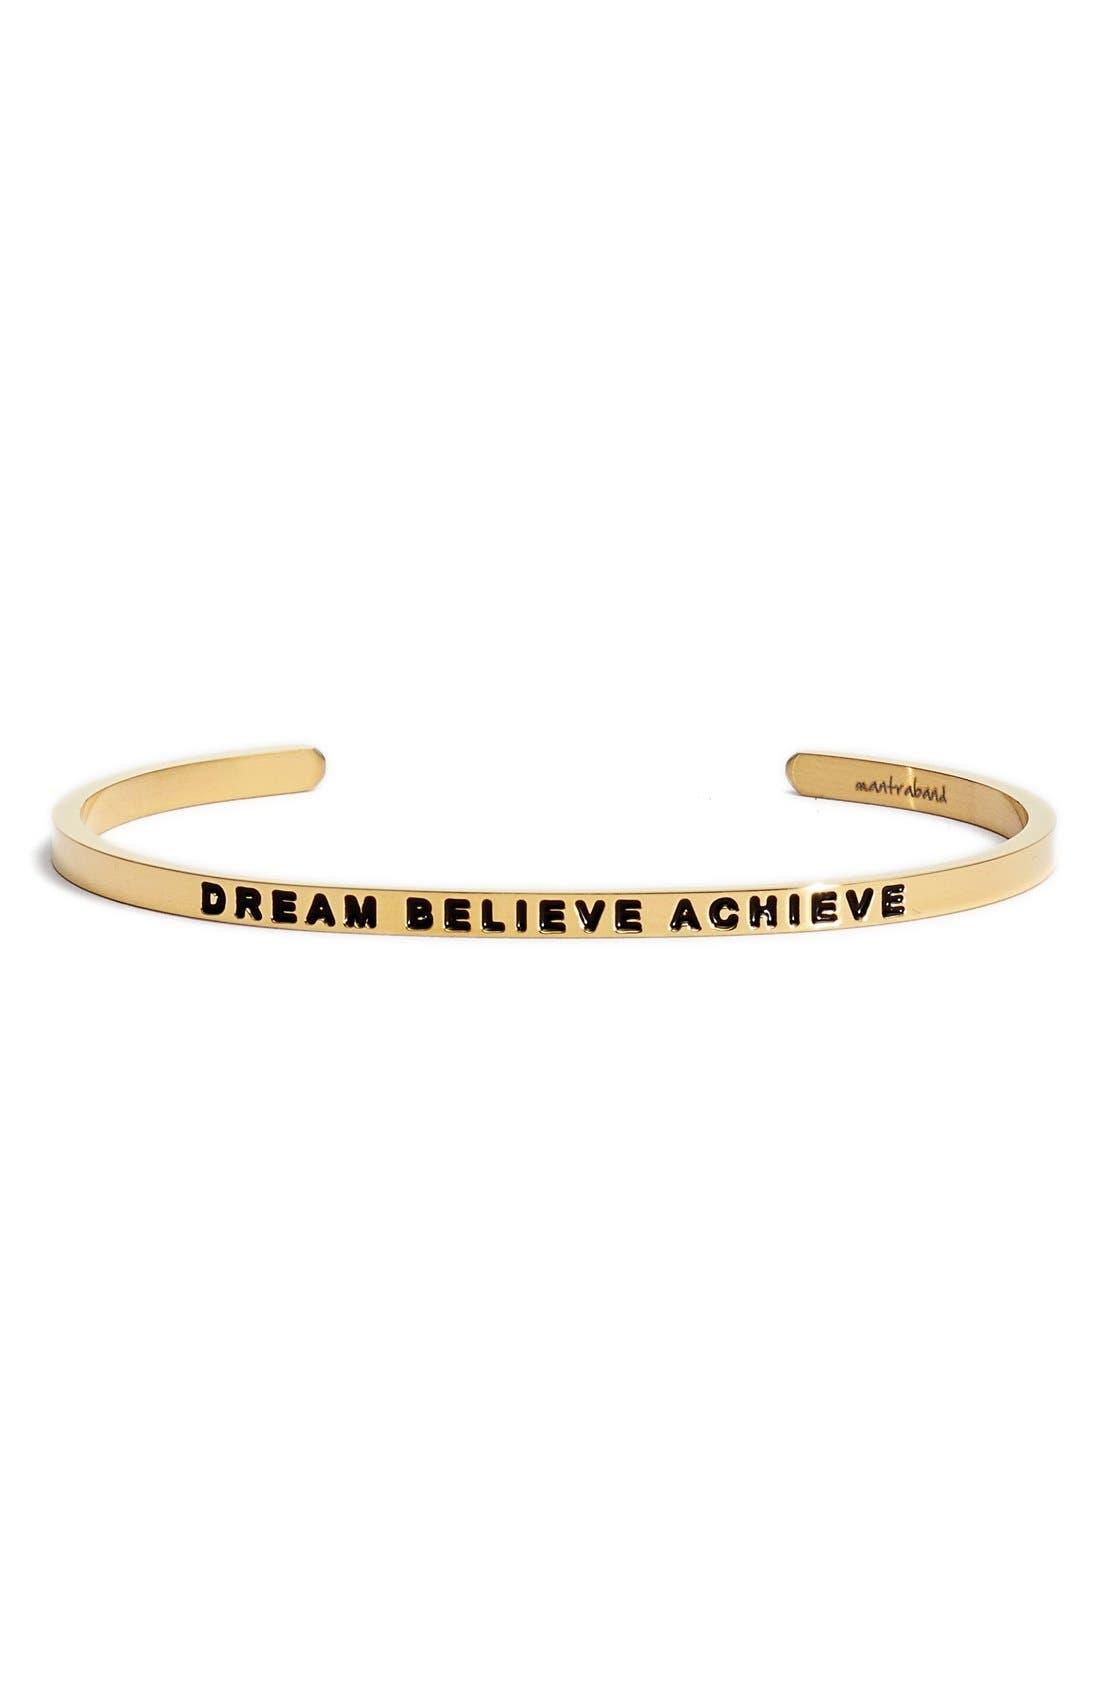 Main Image - MantraBand® 'Dream Believe Achieve' Cuff